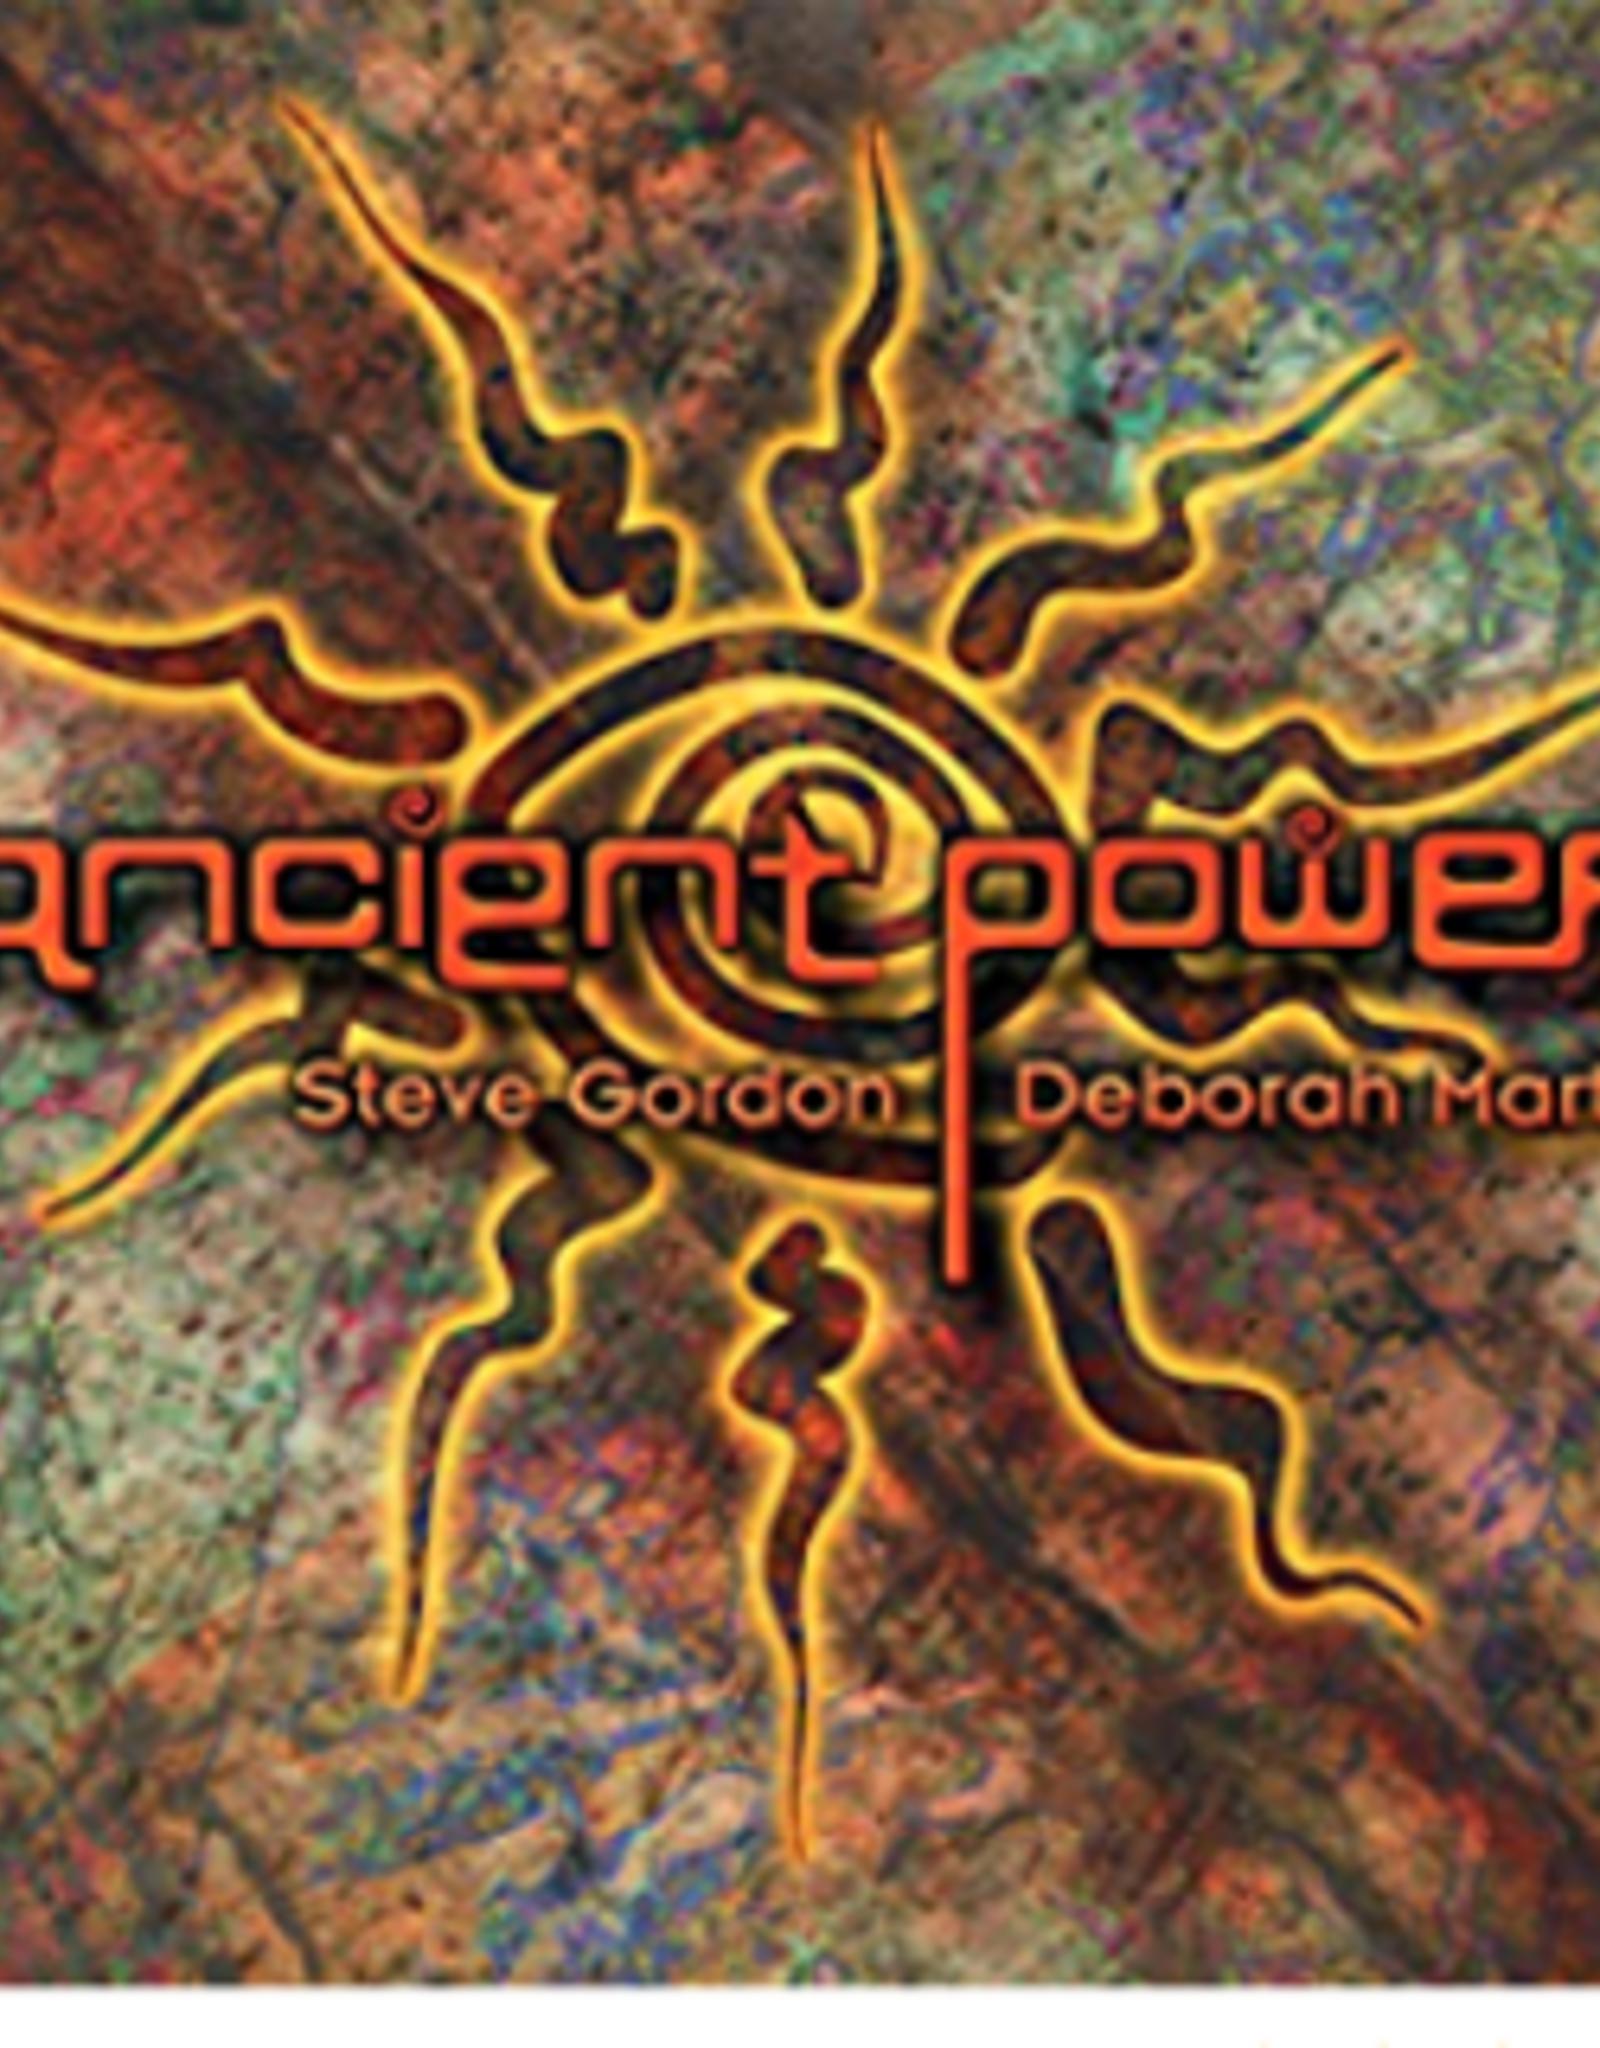 David Gordon Ancient Power CD by David Gordon & Deborah Martin